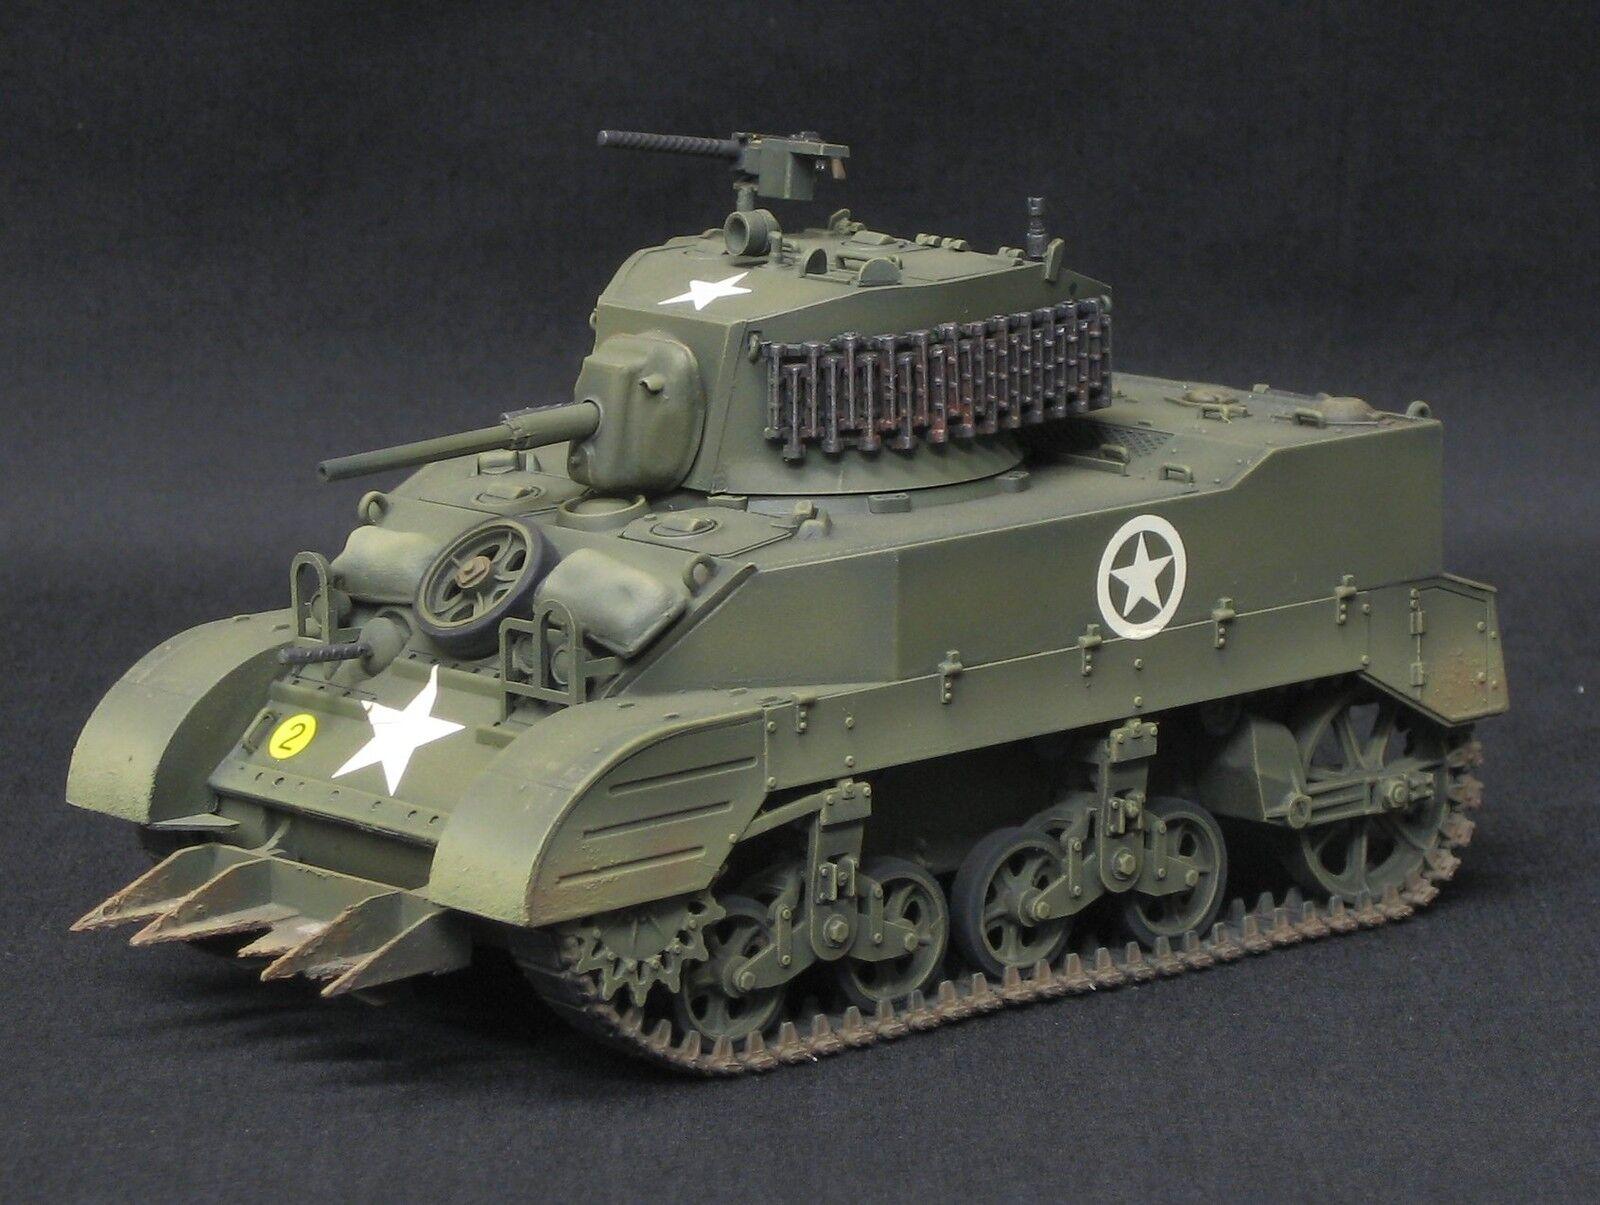 Tamiya m5-a1 us tank pro built and painted 1 35 Dragon airfix Italeri